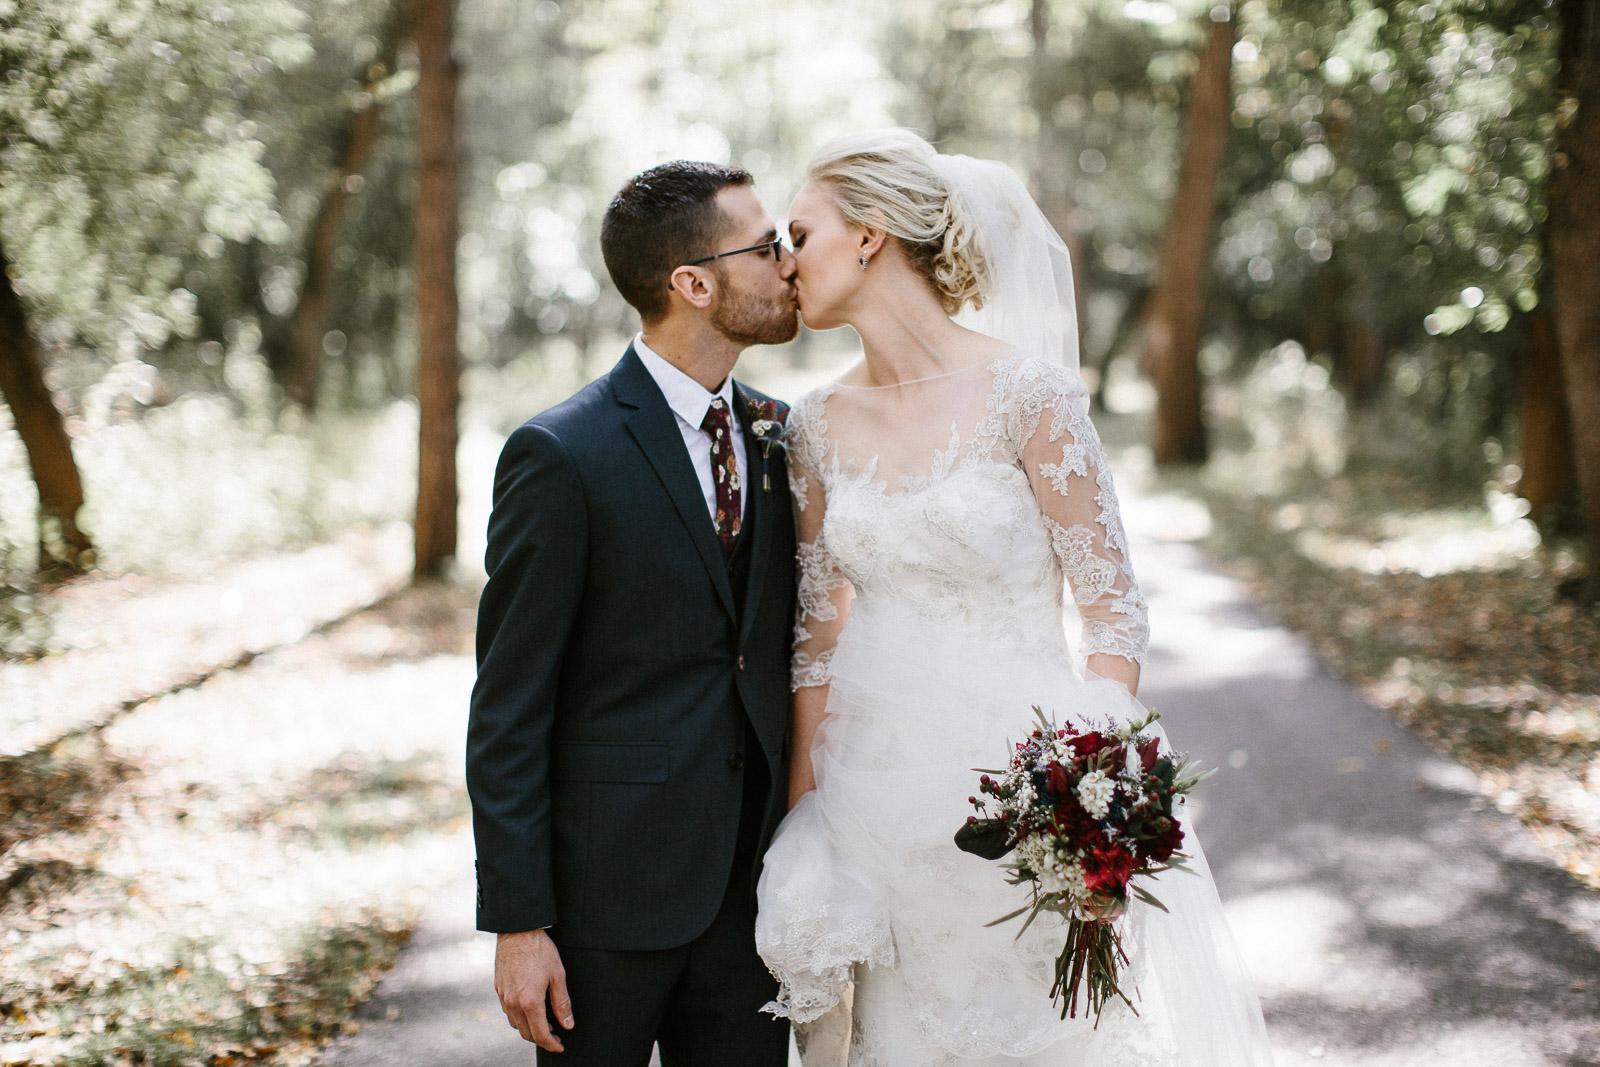 Jenna&Austin_SiouxFalls_Wedding_Photographer_042.jpg